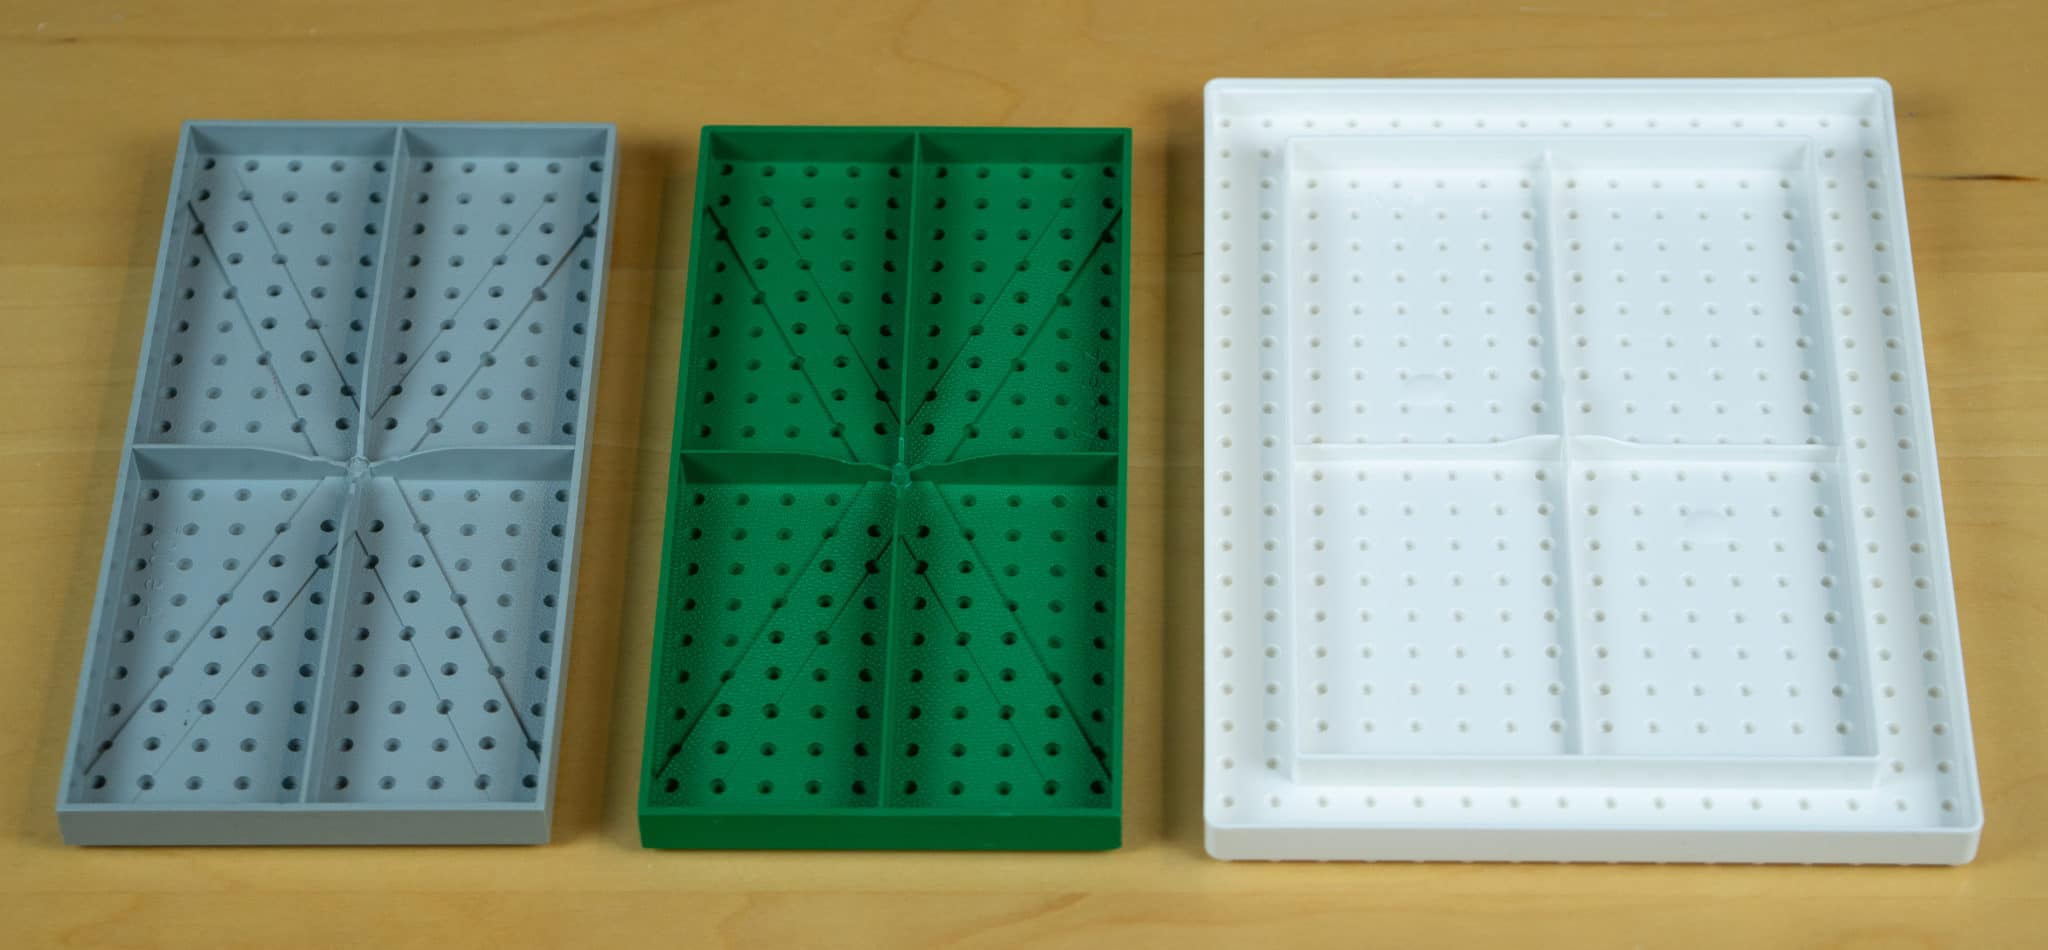 LEGO x IKEA BYGGLEK lid